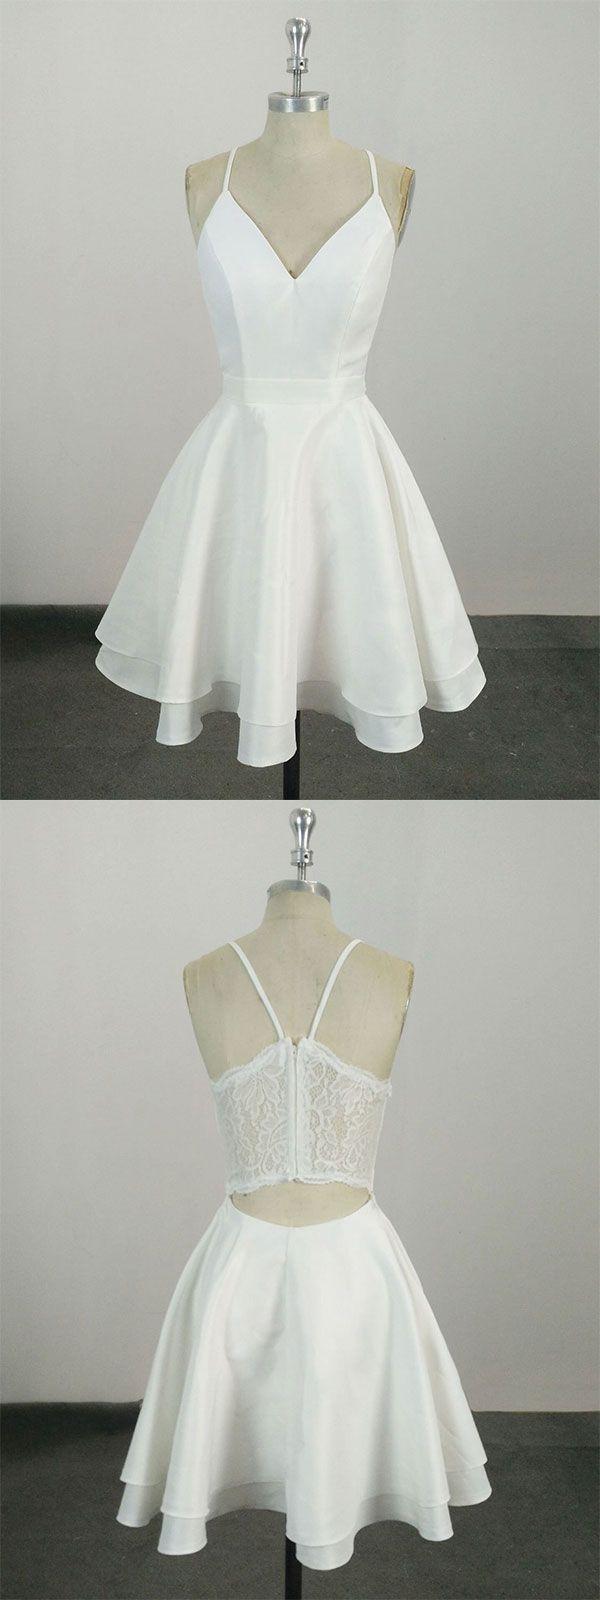 White v neck satin lace short prom dress white homecoming dress in